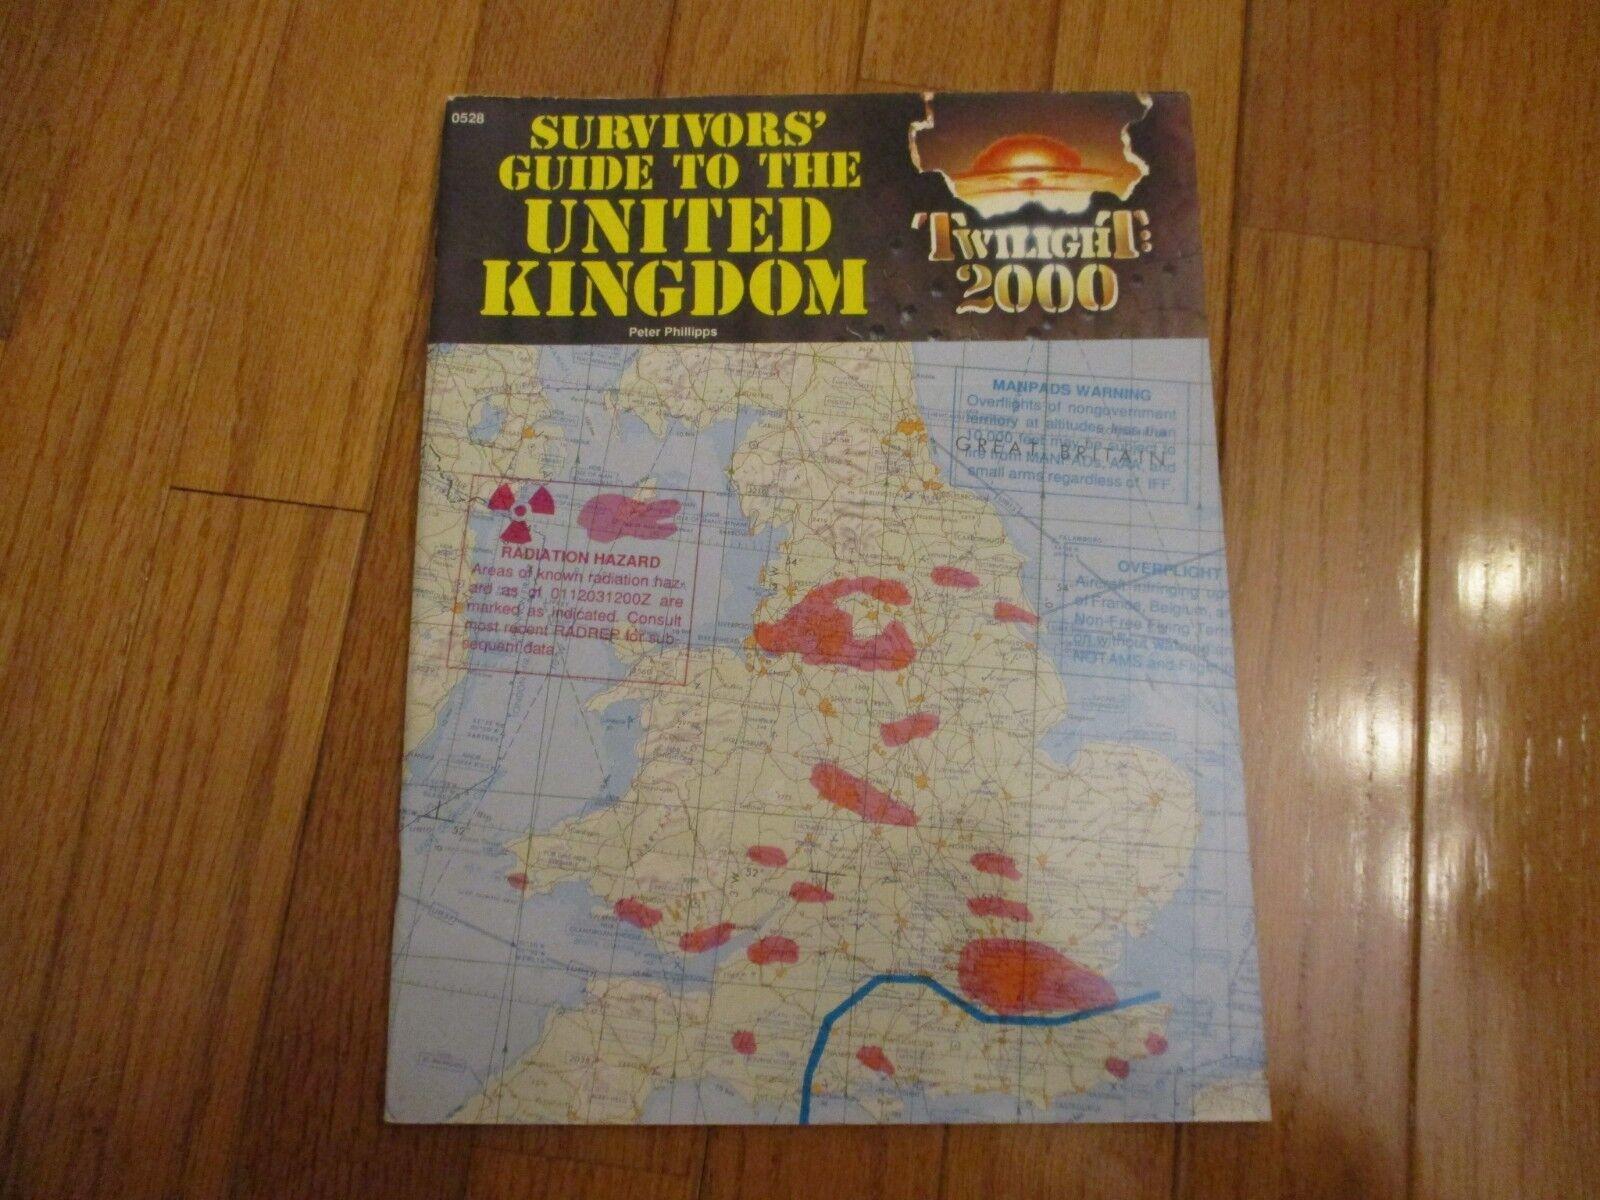 Twilight 2000 RPG Survivors' Guide to the United Kingdom